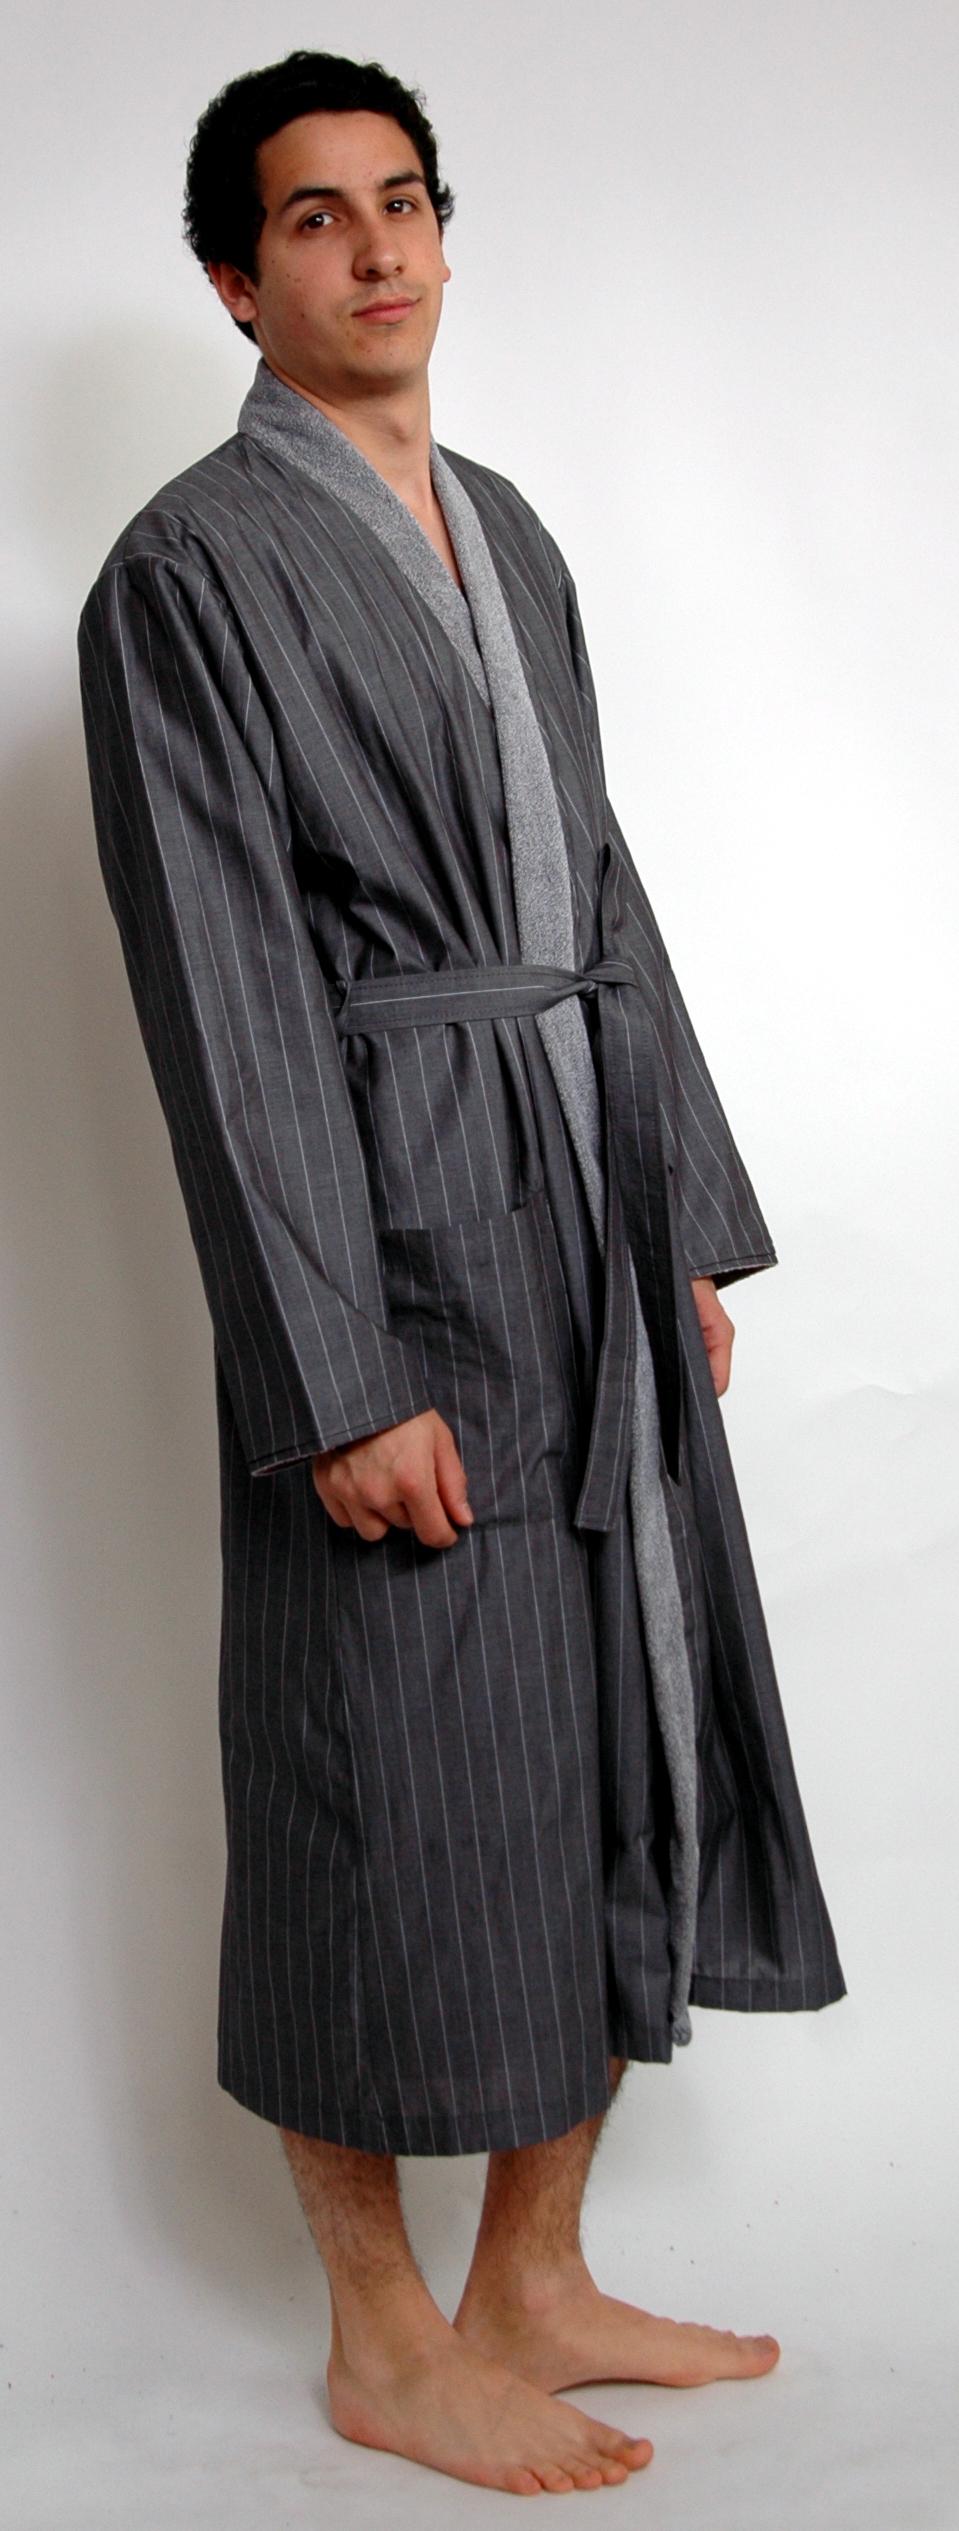 herren kimono morgenmantel von bugatti bademantel morgenmantel badem ntel. Black Bedroom Furniture Sets. Home Design Ideas